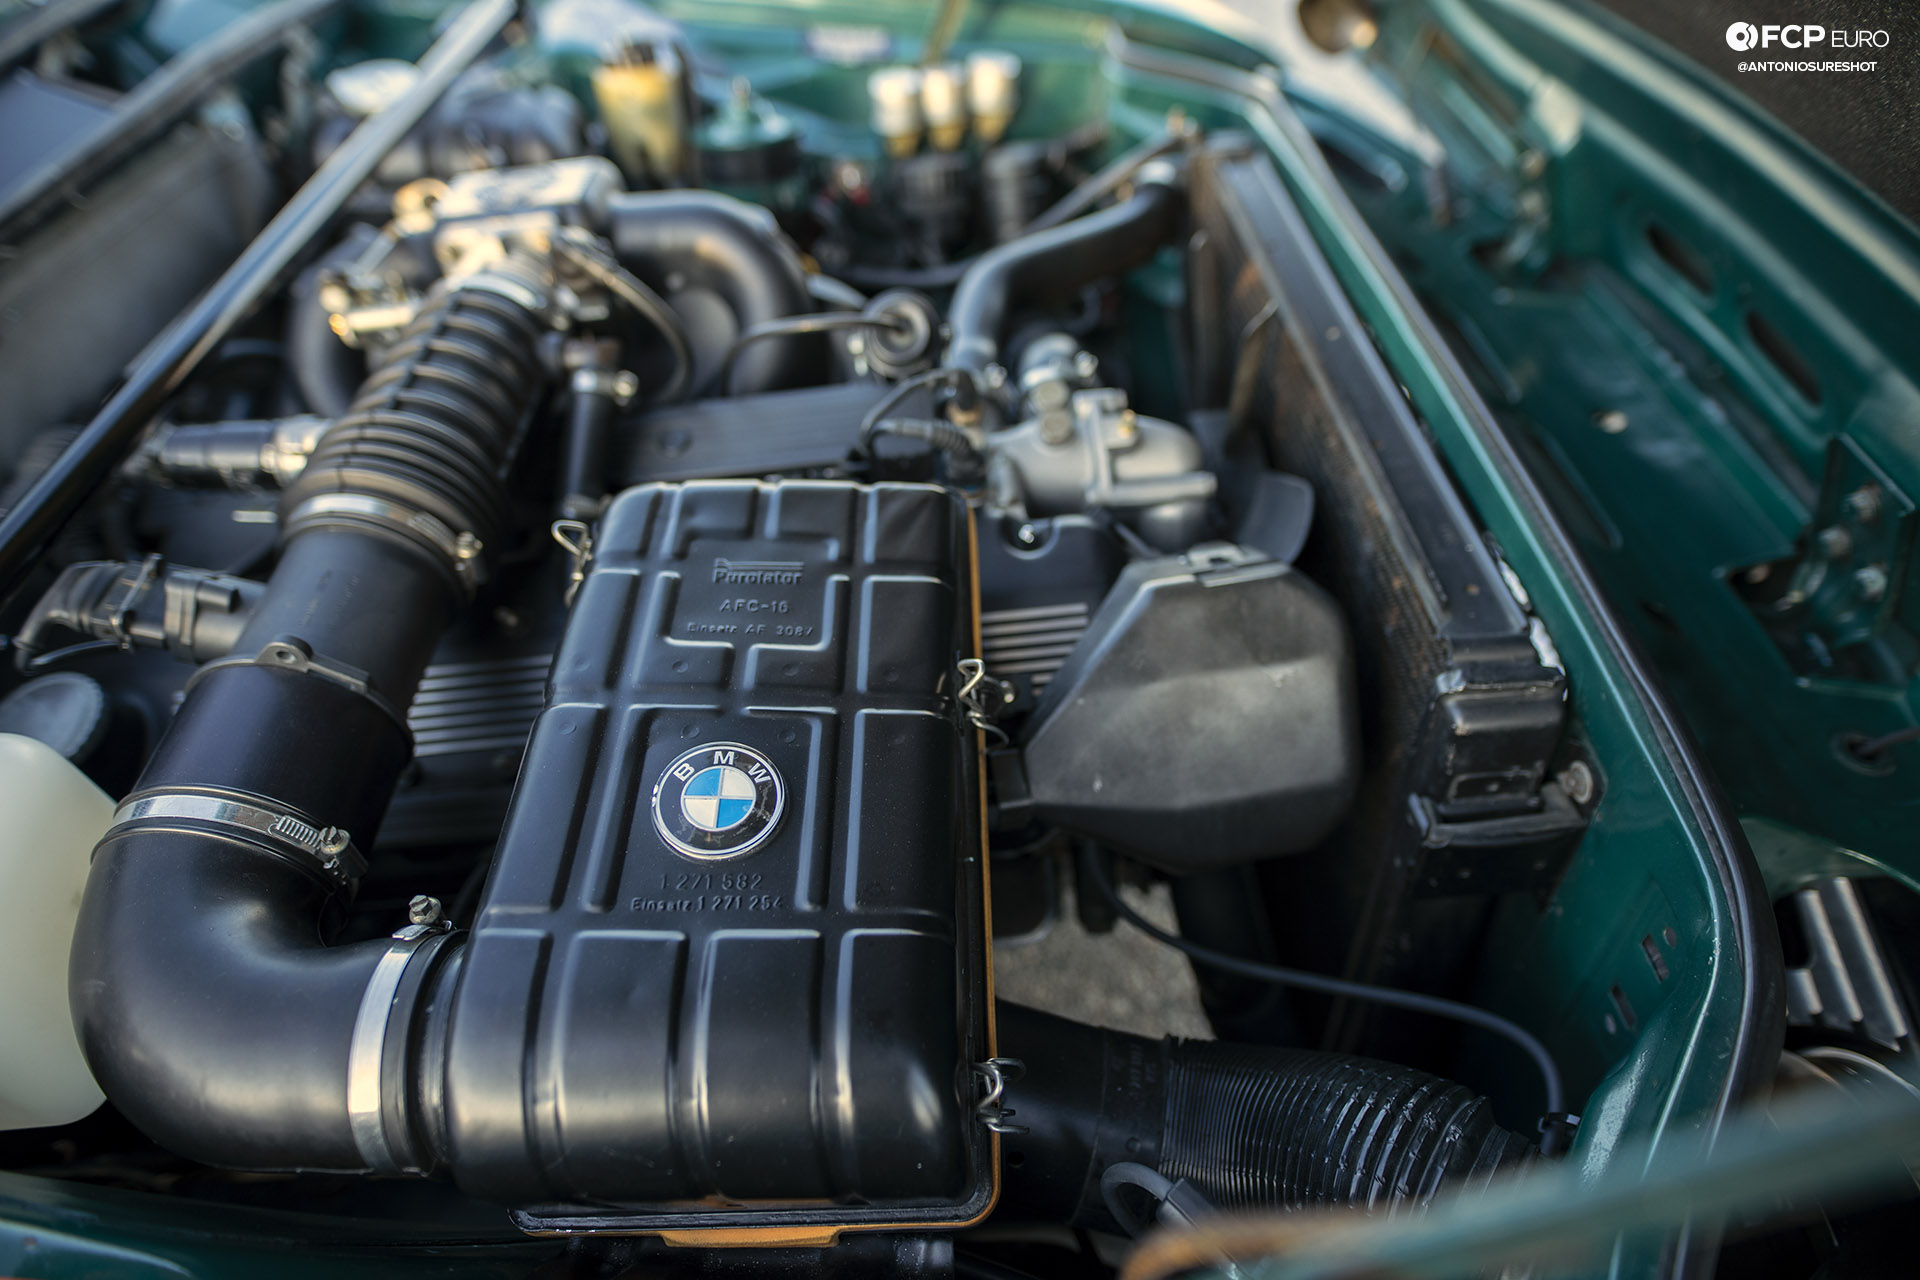 E3 BMW Bavaria EOSR5764